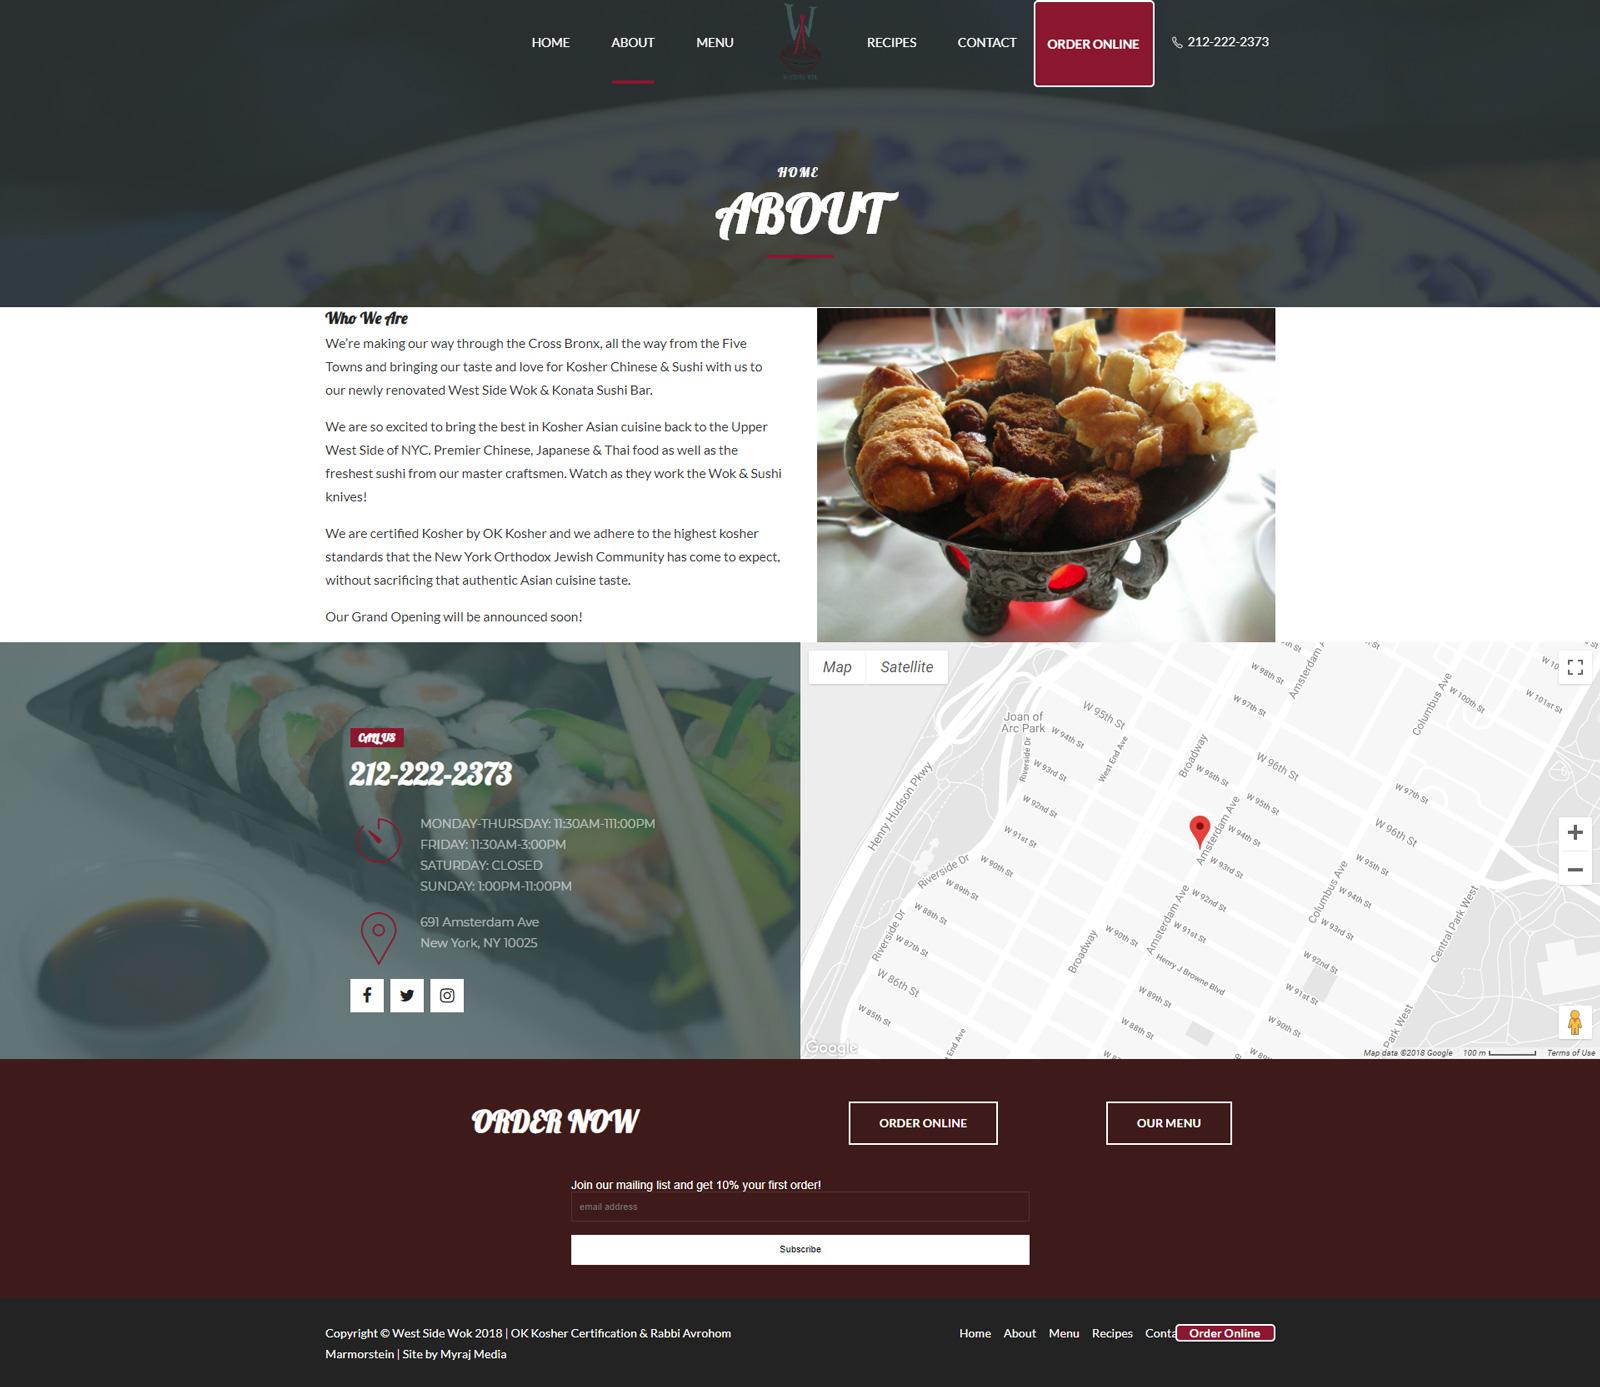 West Side Wok & Konata Sushi Bar